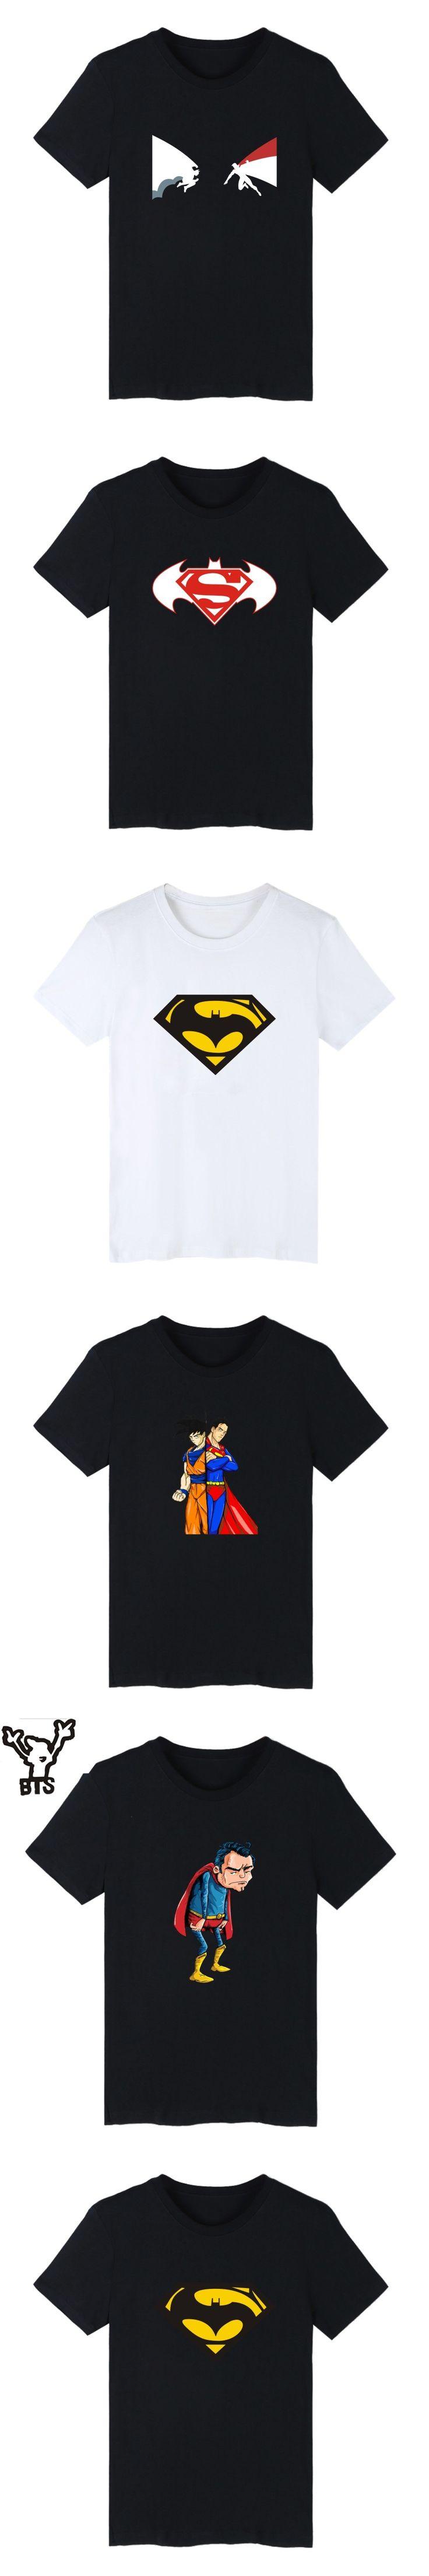 BTS Old Superman VS Batman 4XL T Shirt Men 2016 New Cotton Mens and Super Saiyan Print Funny T-shirt in TShirt Tee Top